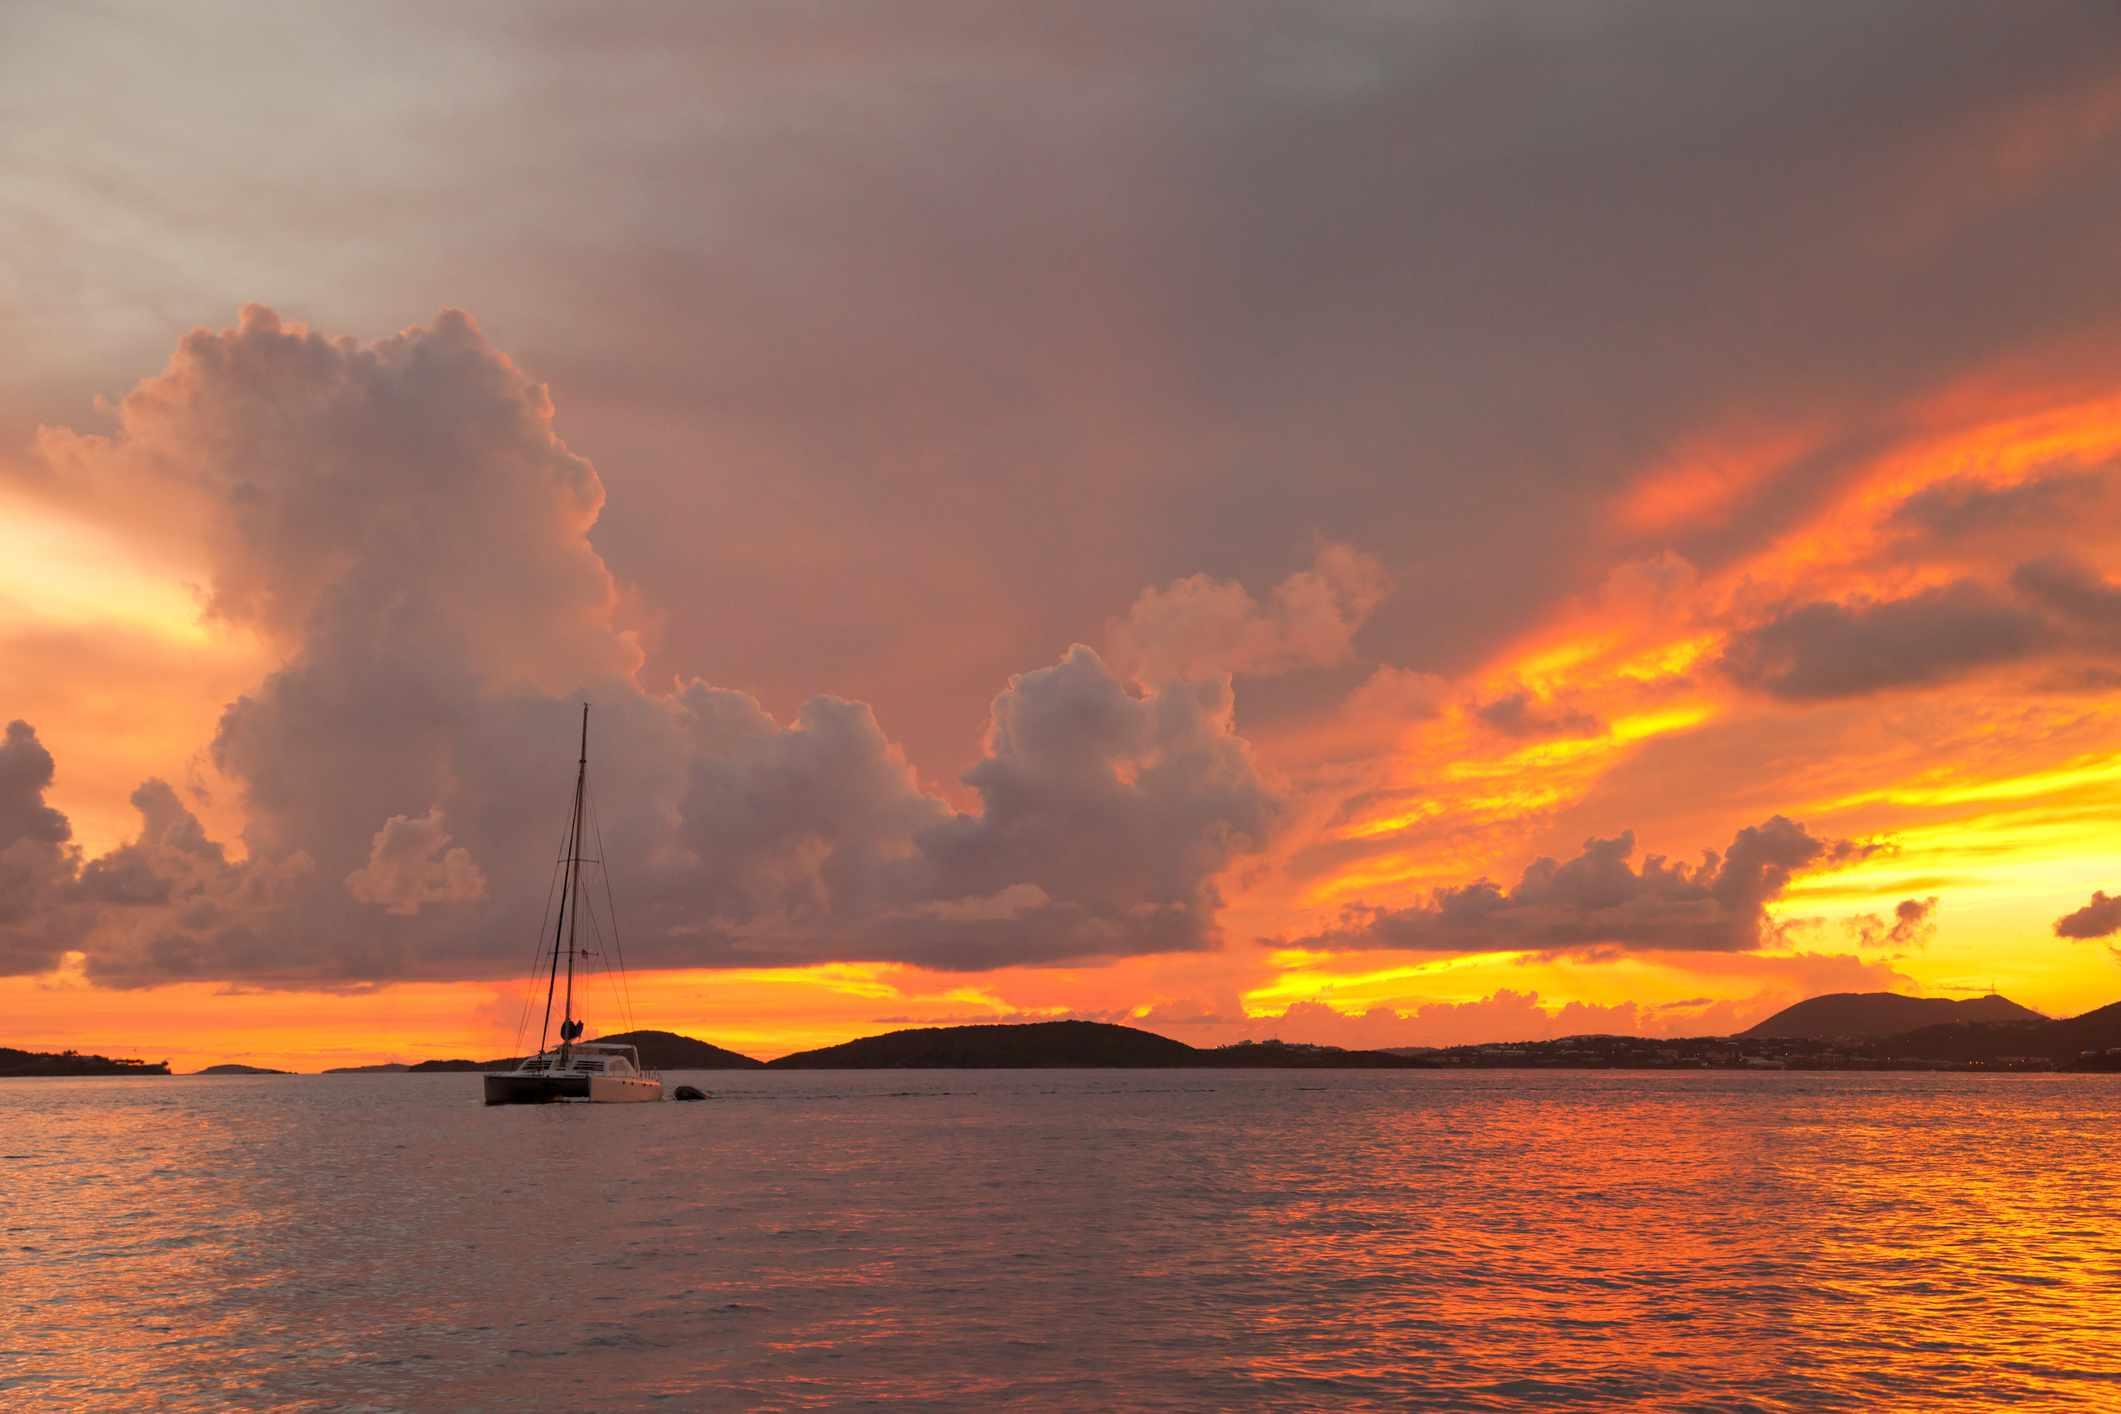 Seaside sunset in the U.S. Virgin Islands